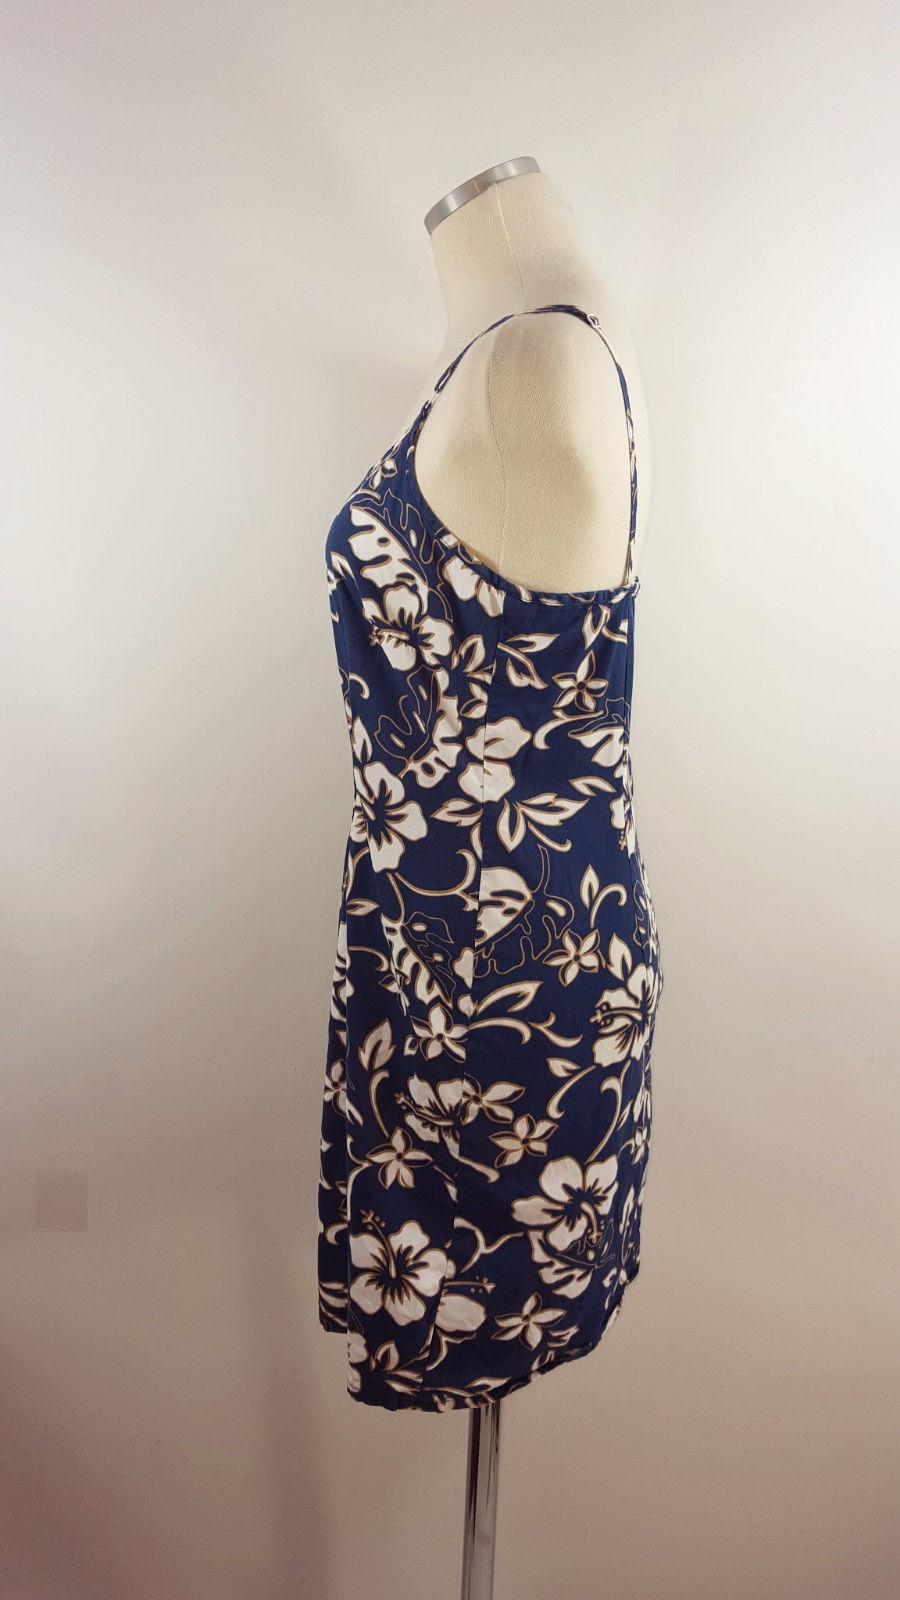 Hilo Hattie Sz Sm Navy Blue Floral Short Hawaiian Dress